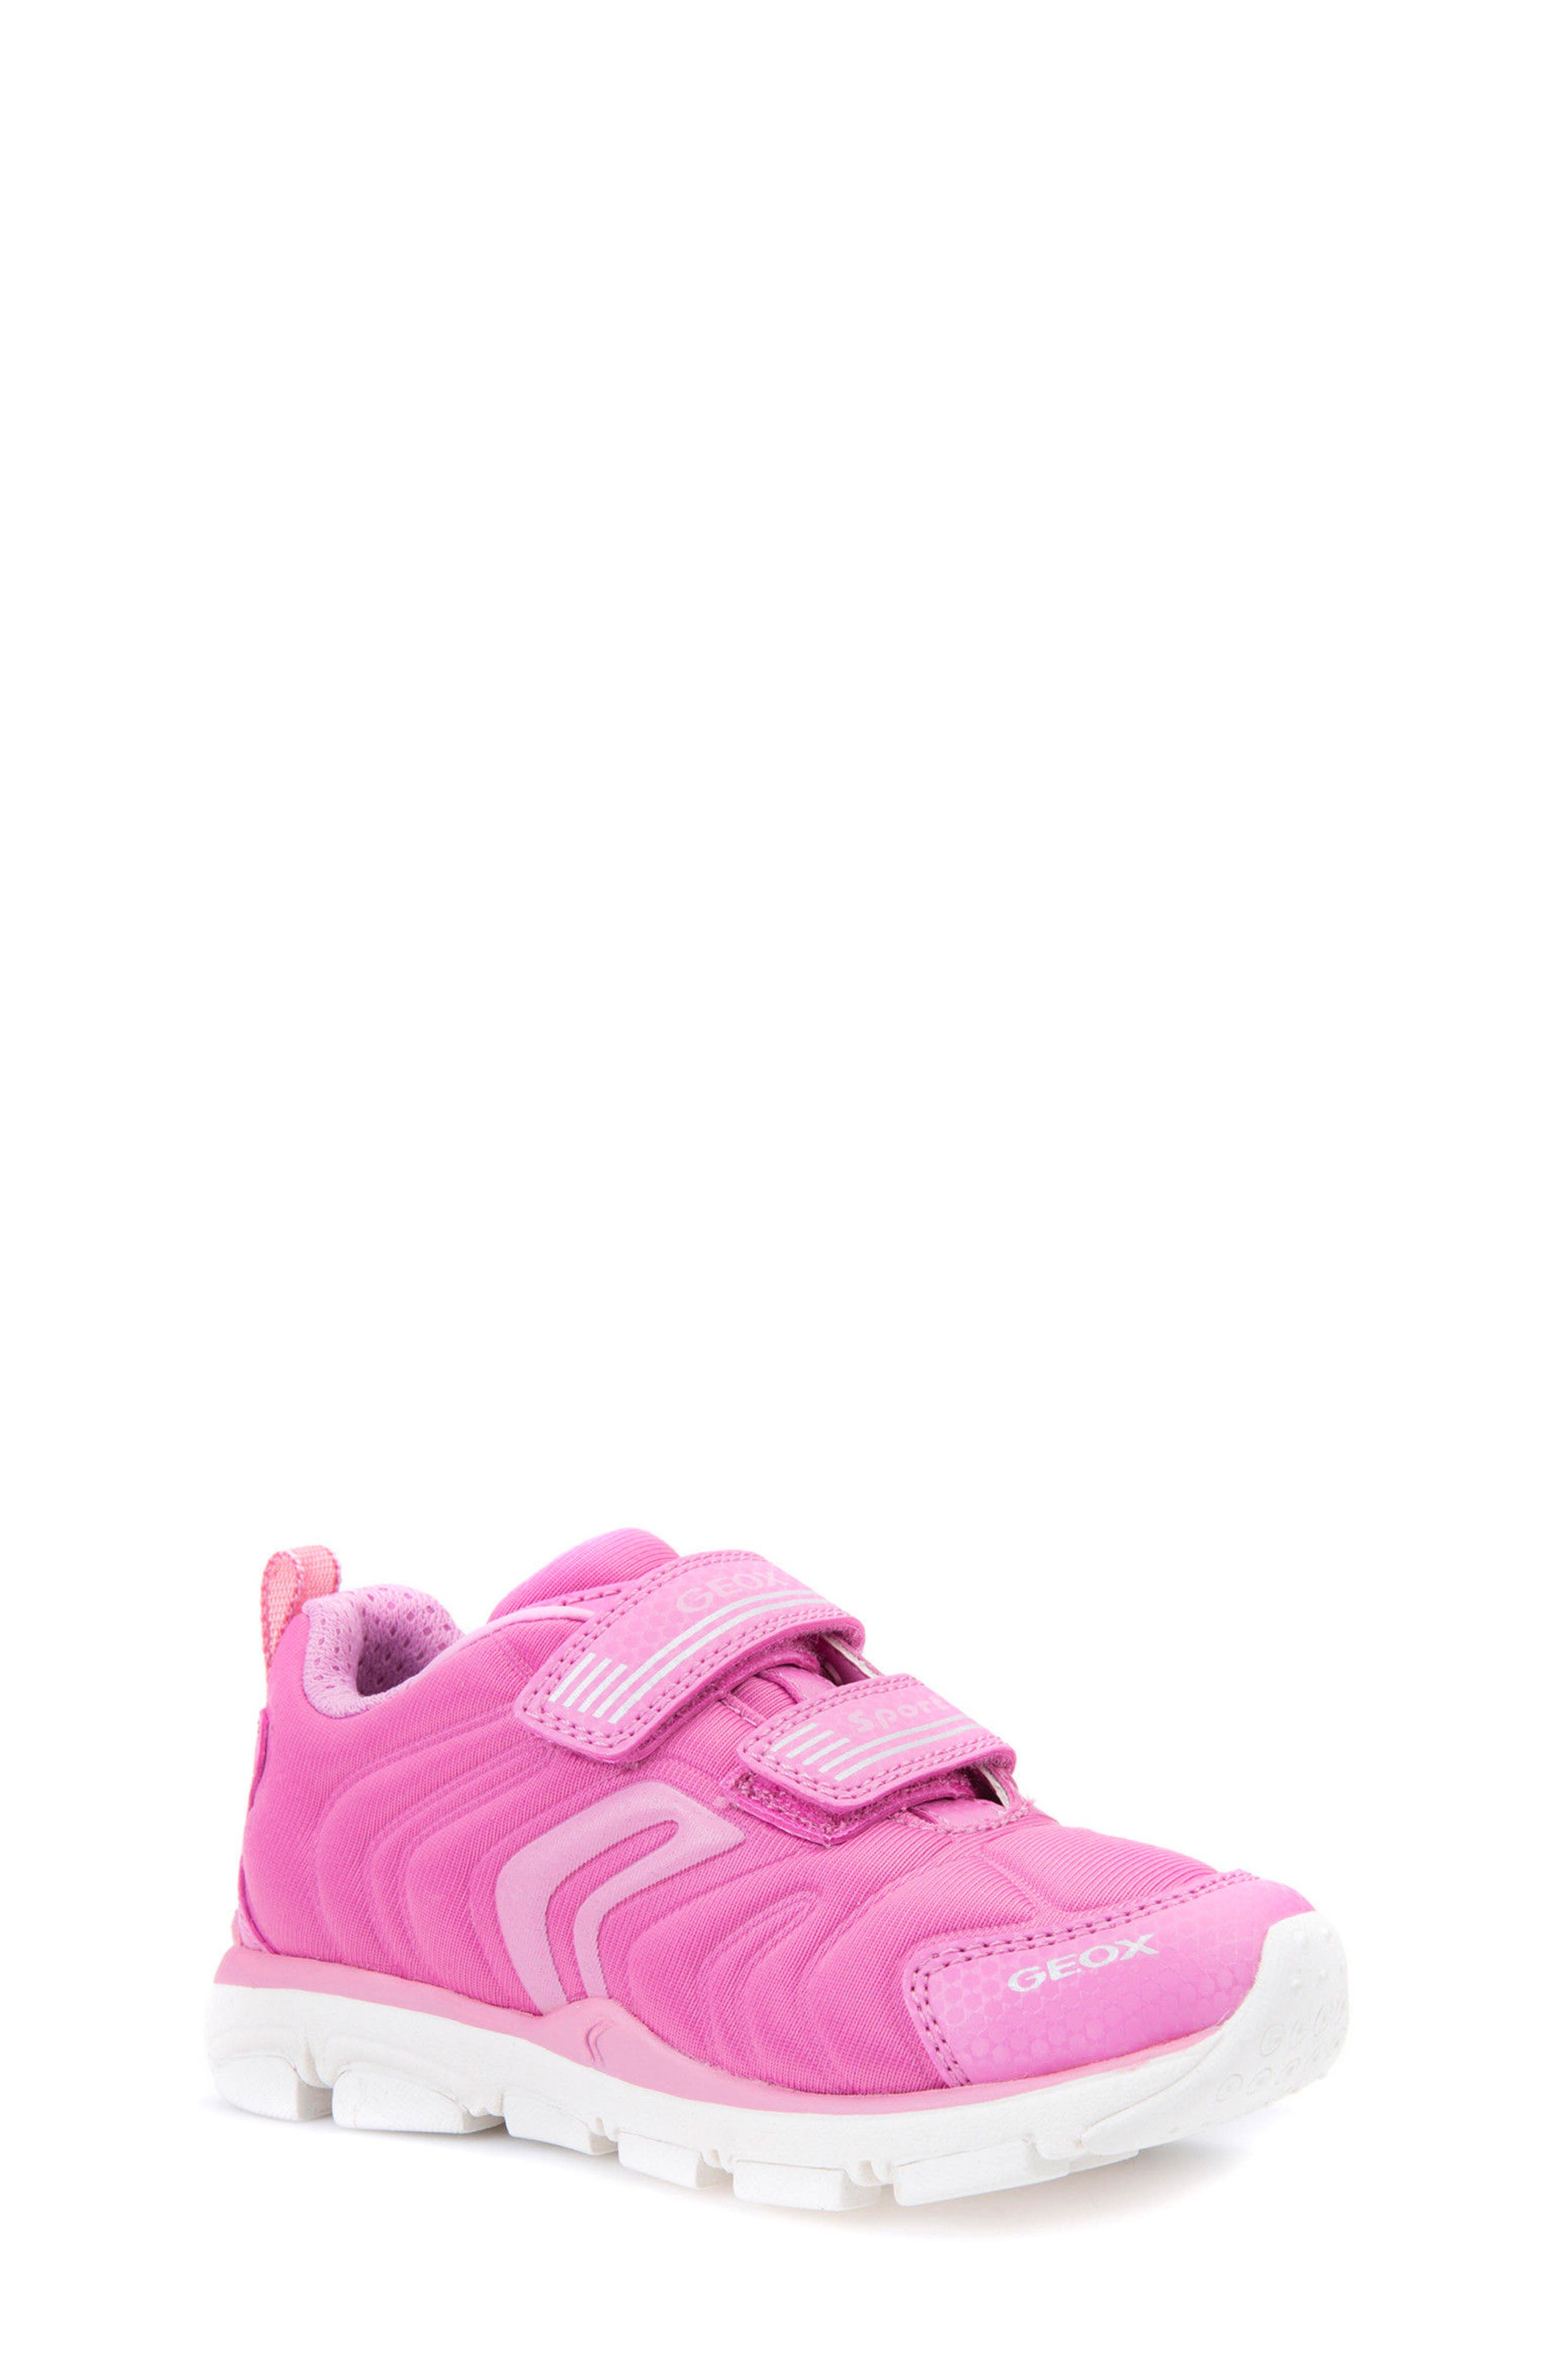 Torque Sneaker,                             Main thumbnail 1, color,                             660